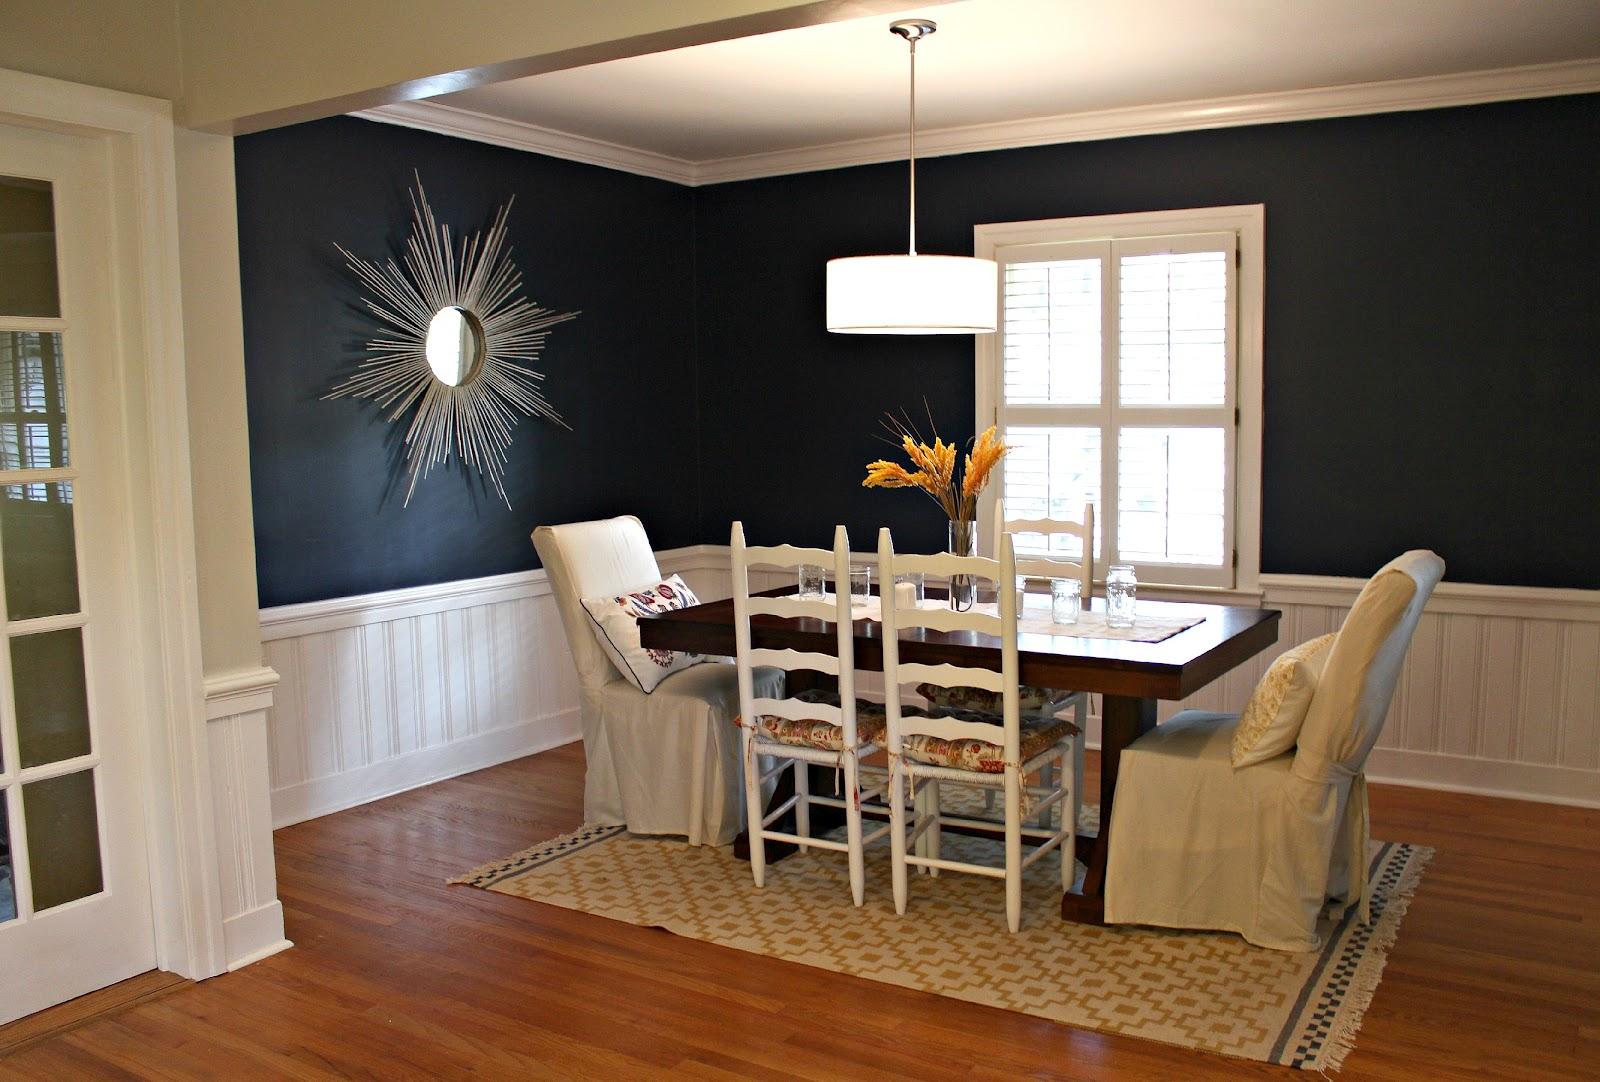 ten june diy bamboo sunburst mirror. Black Bedroom Furniture Sets. Home Design Ideas